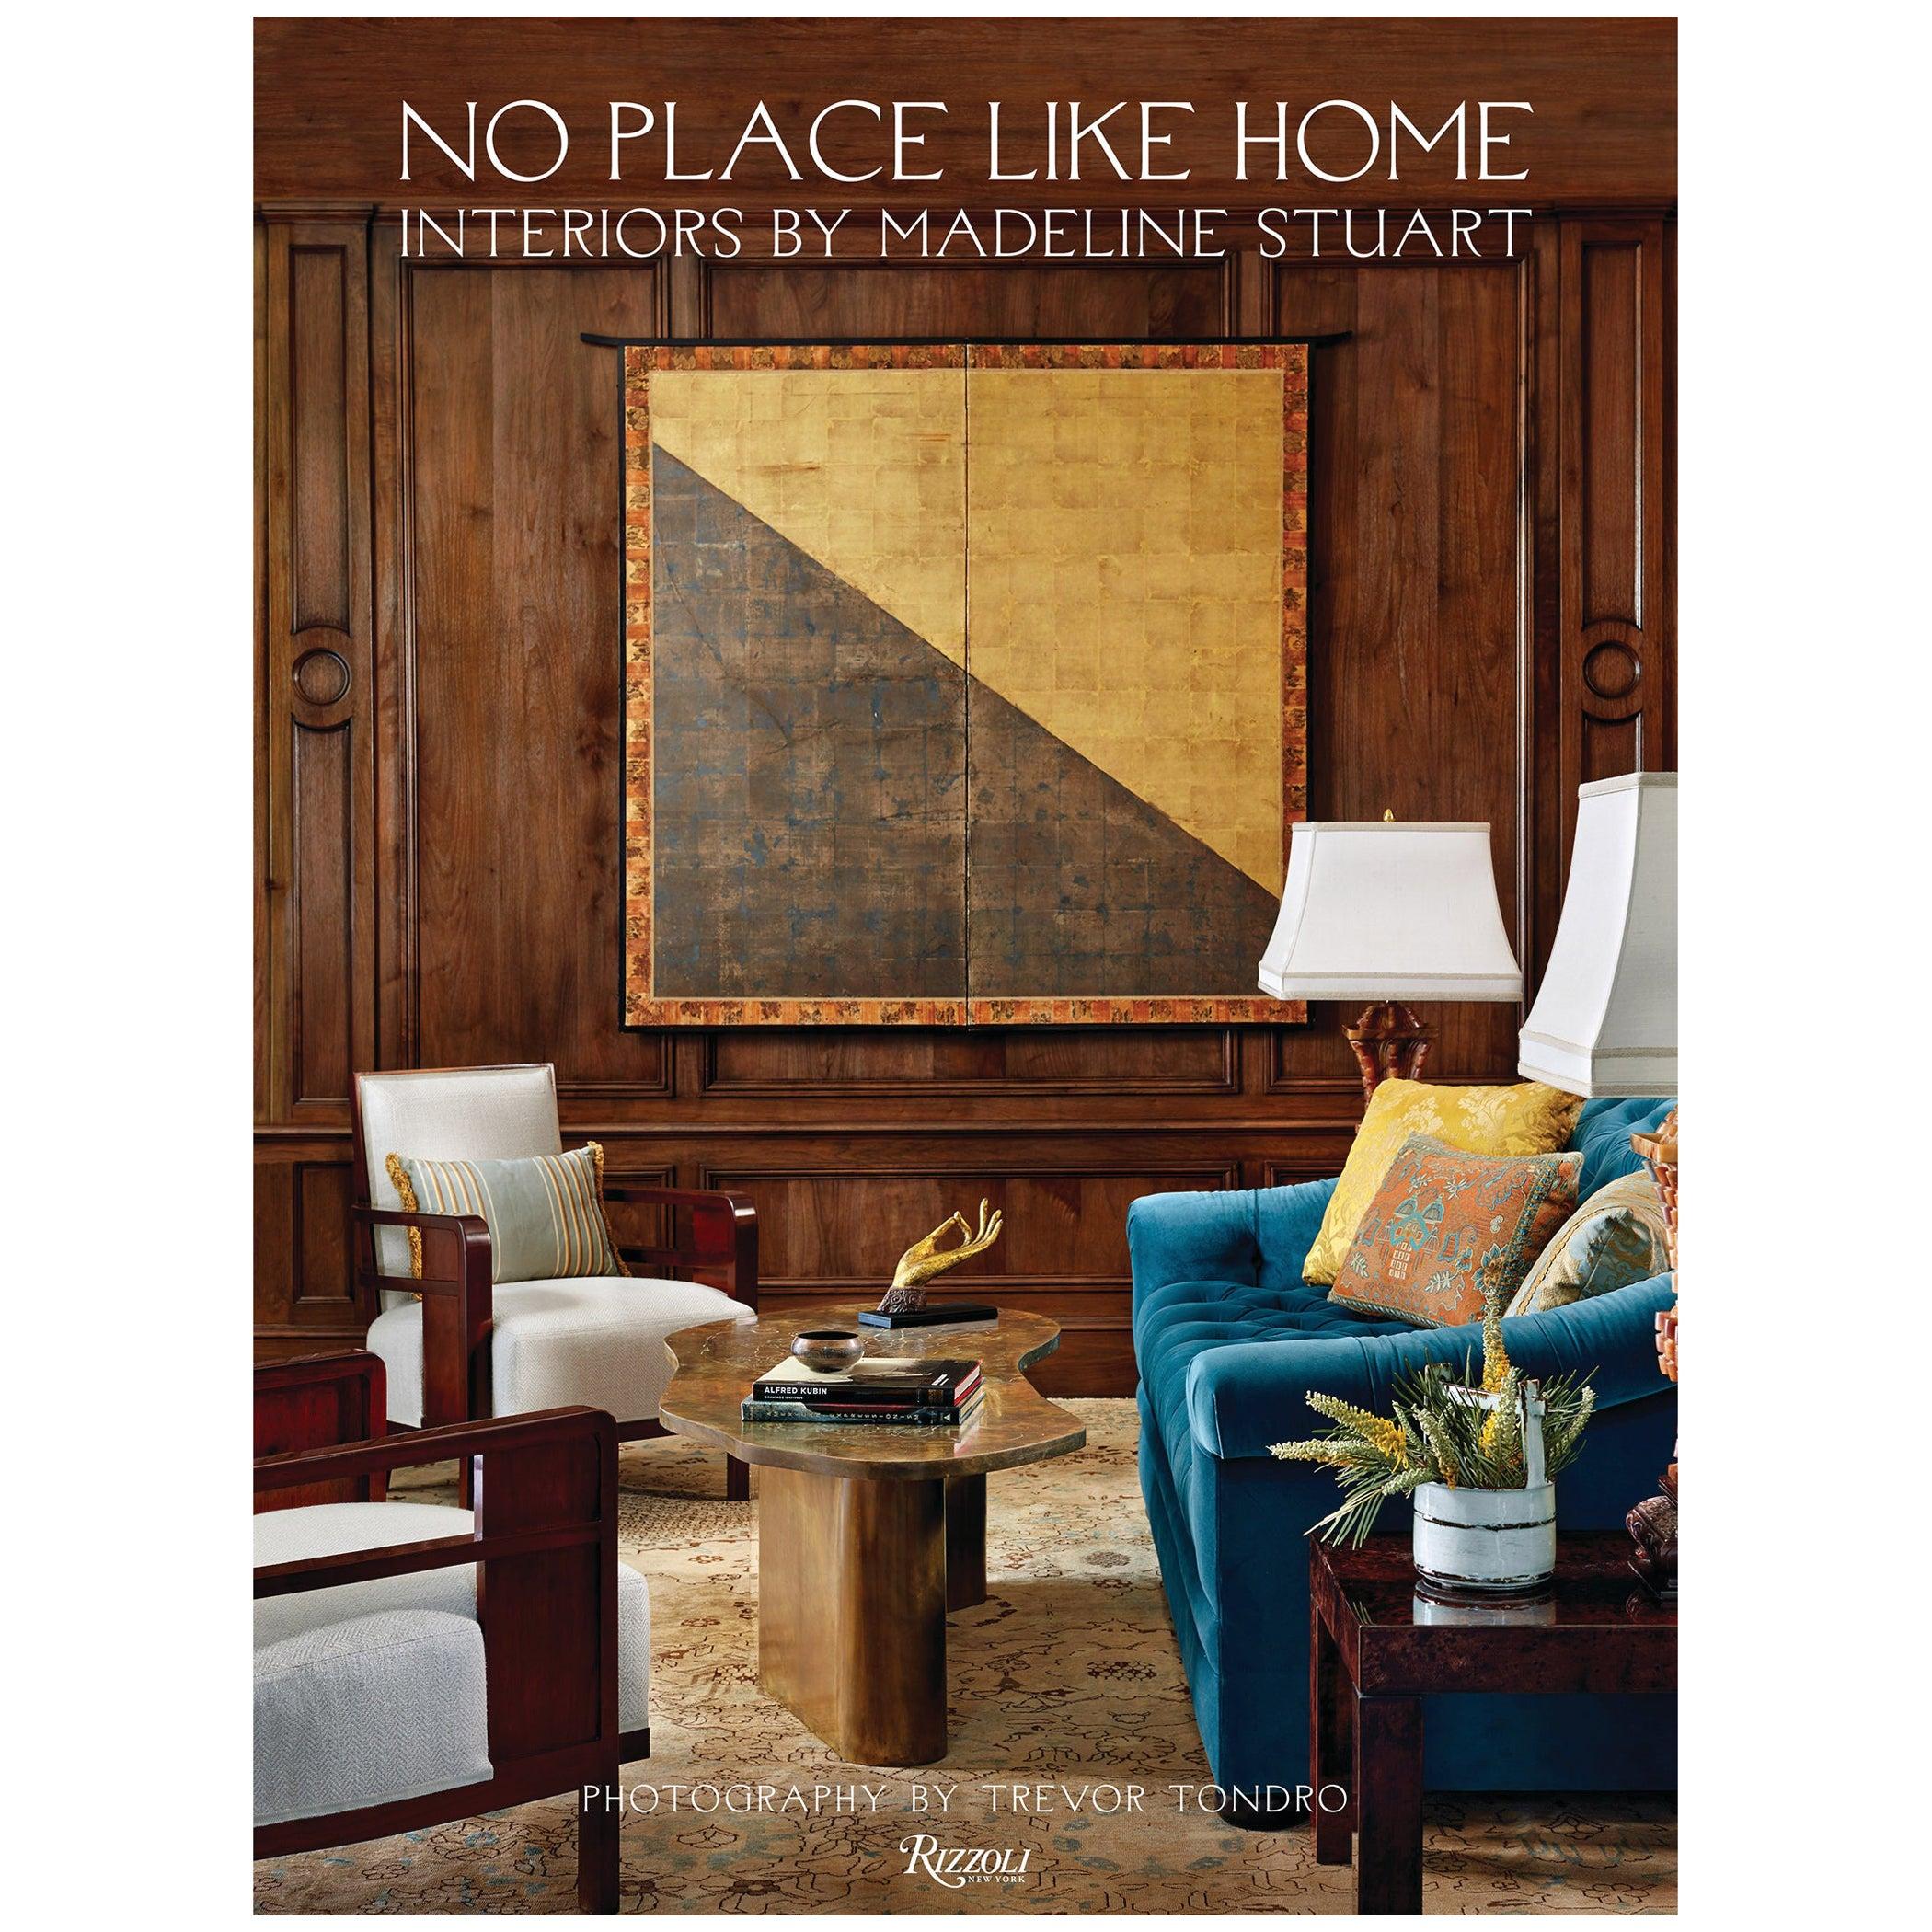 No Place Like Home Interiors by Madeline Stuart